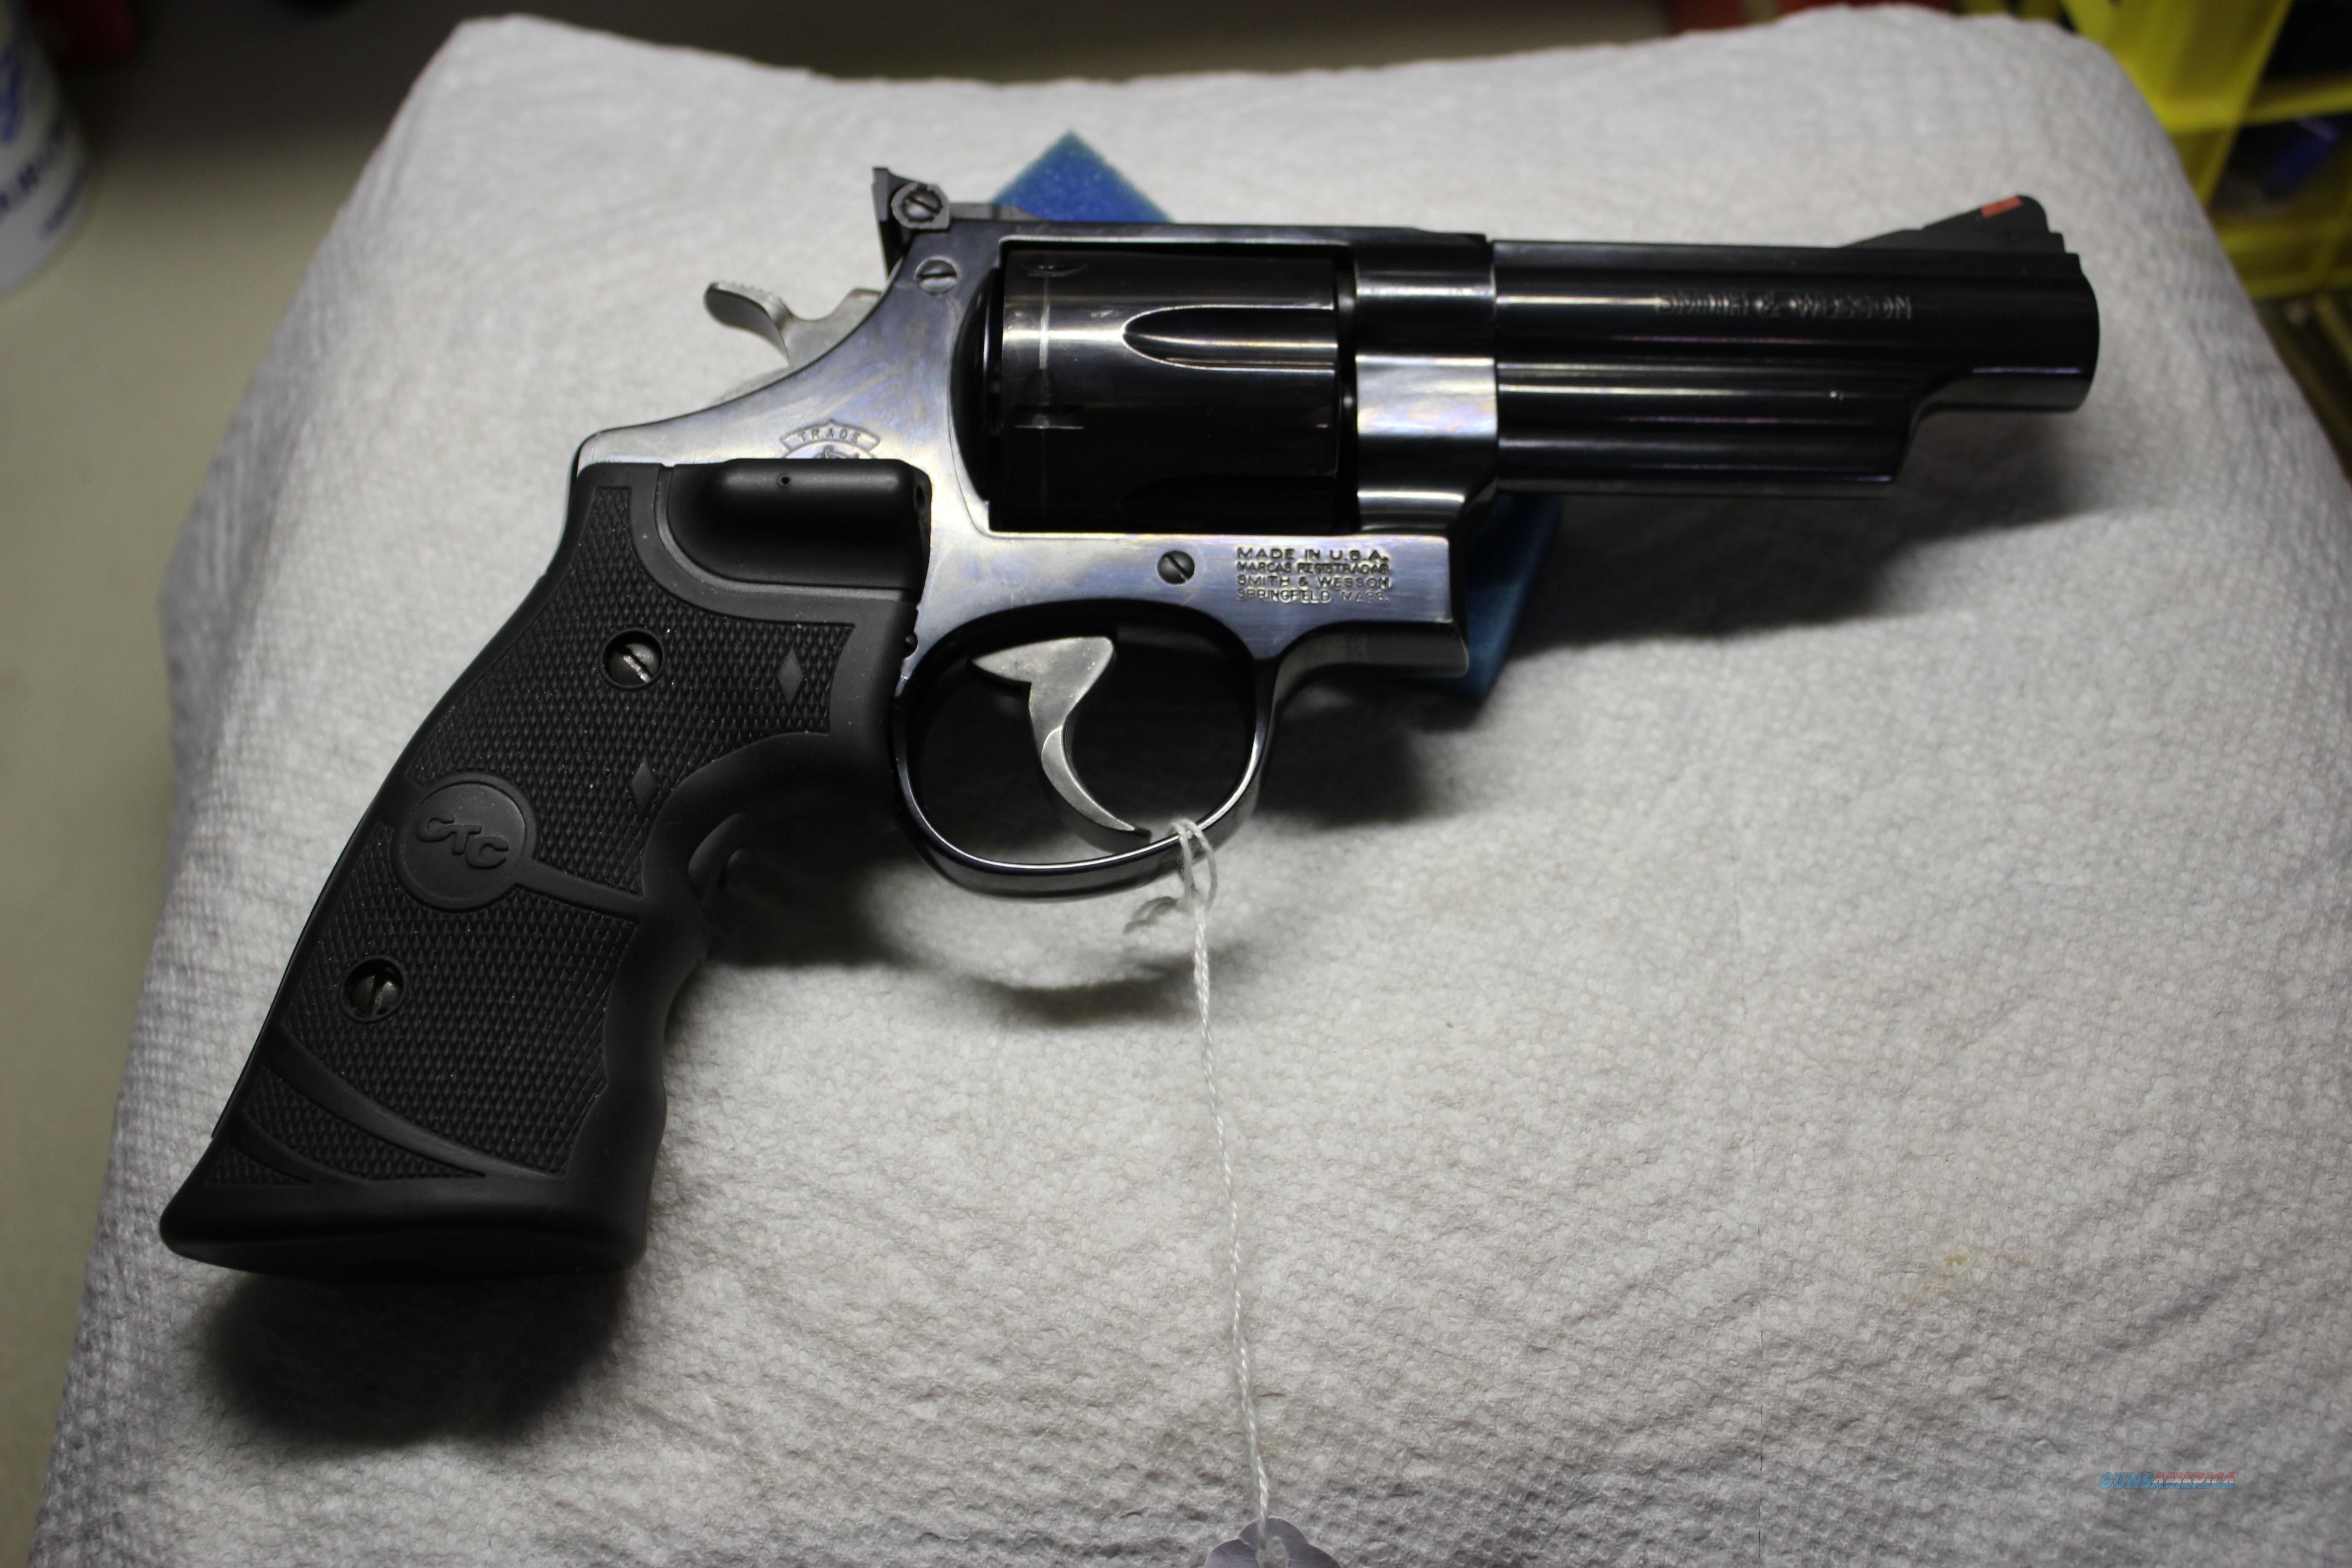 SMITH & WESSON  29-10  Guns > Pistols > Smith & Wesson Revolvers > Full Frame Revolver